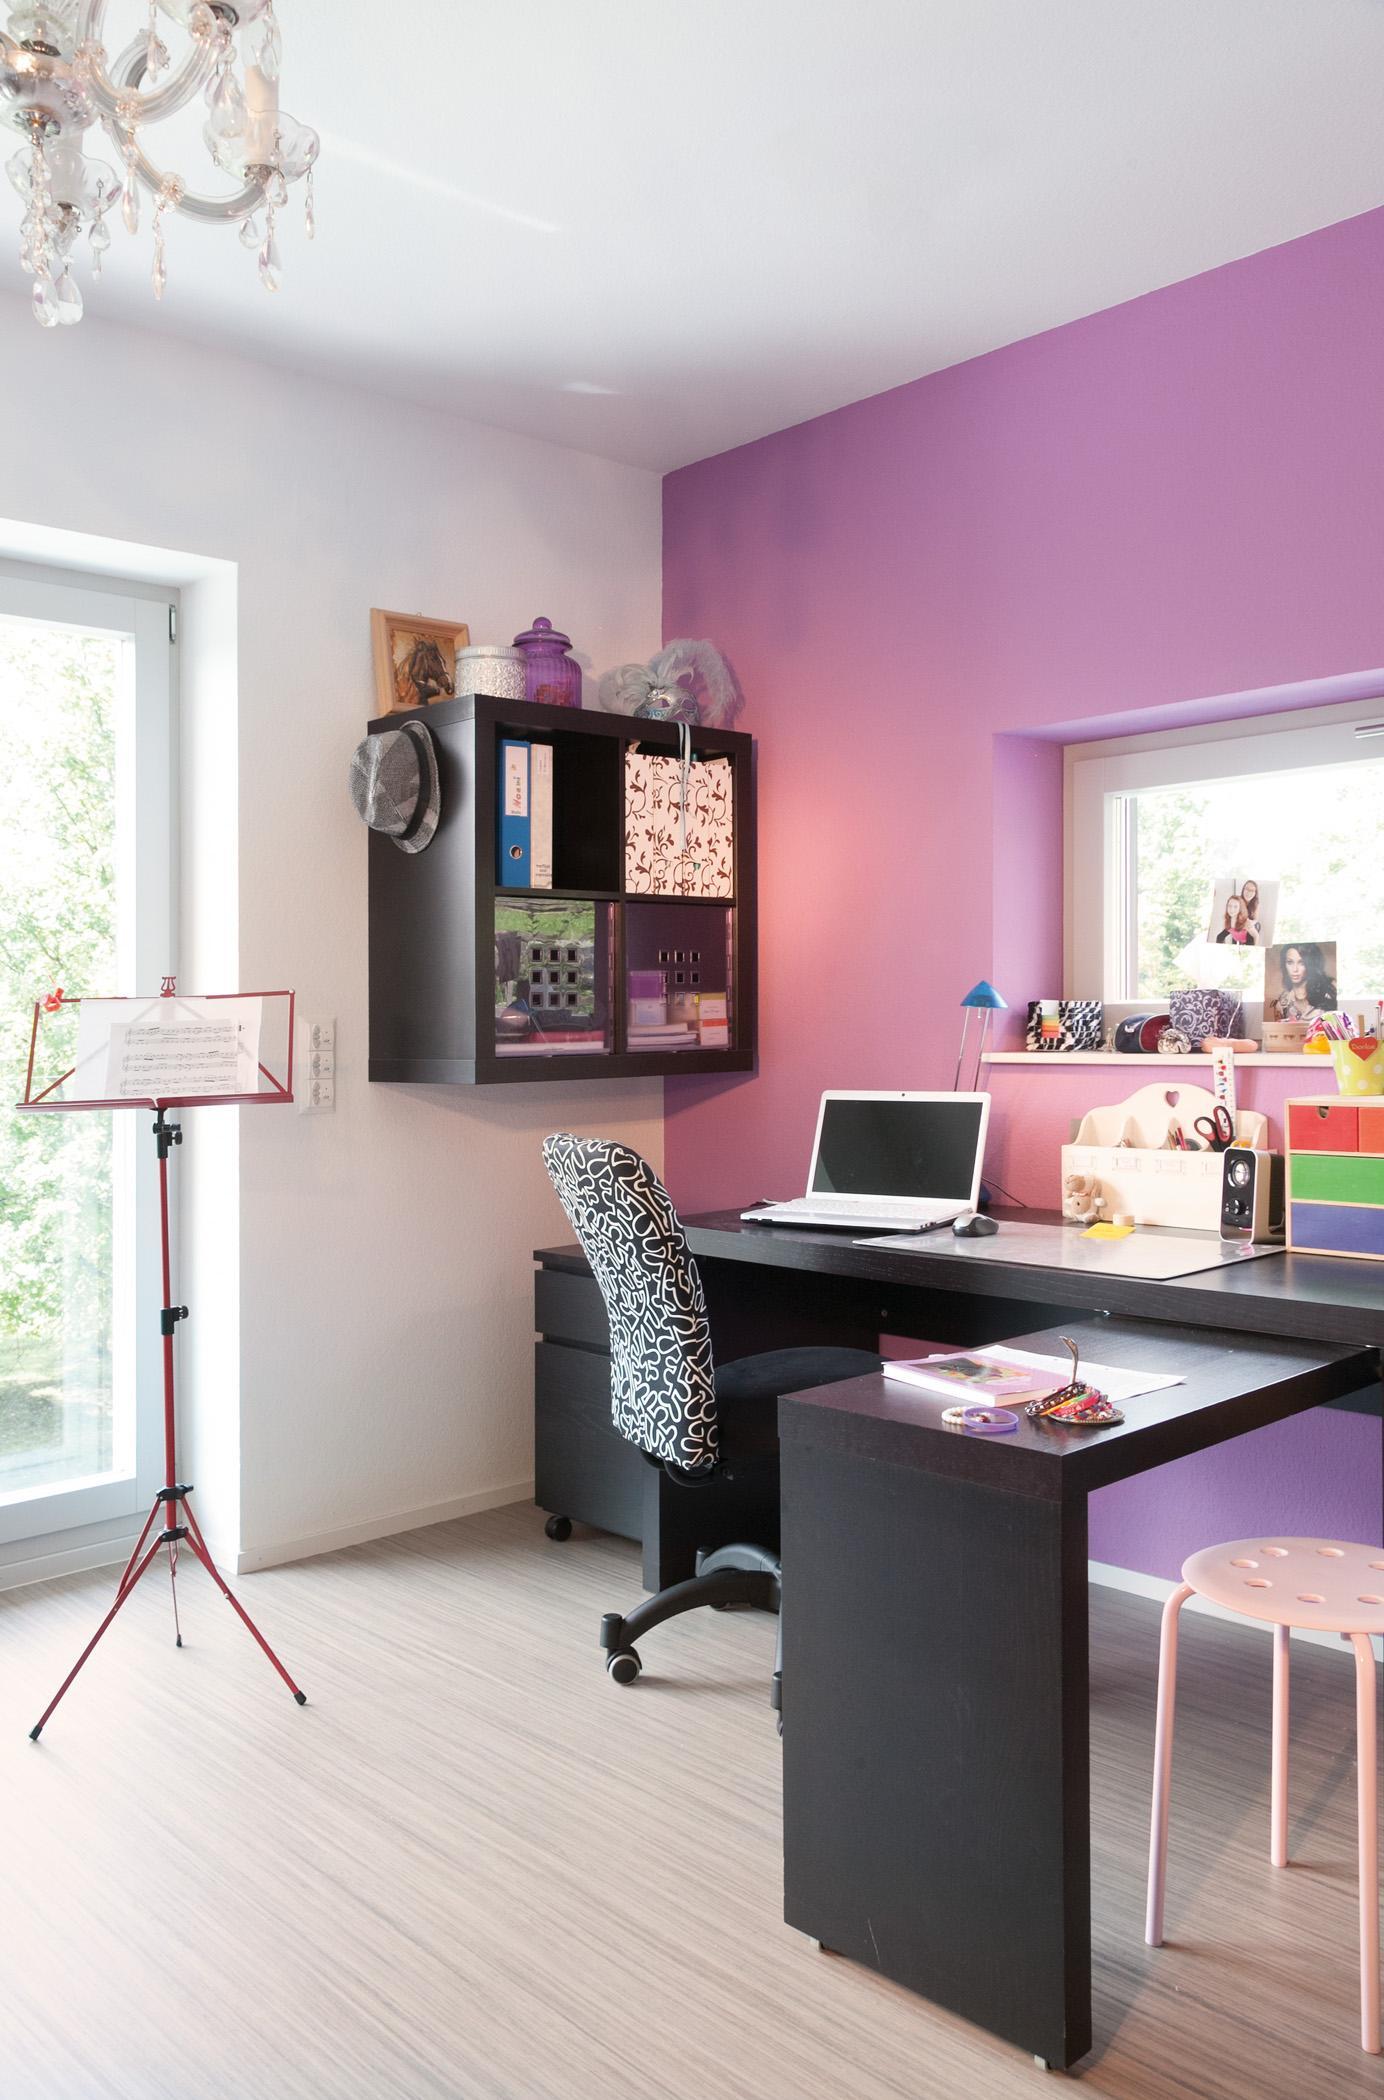 Lila Wandgestaltung • Bilder & Ideen • Couchstyle